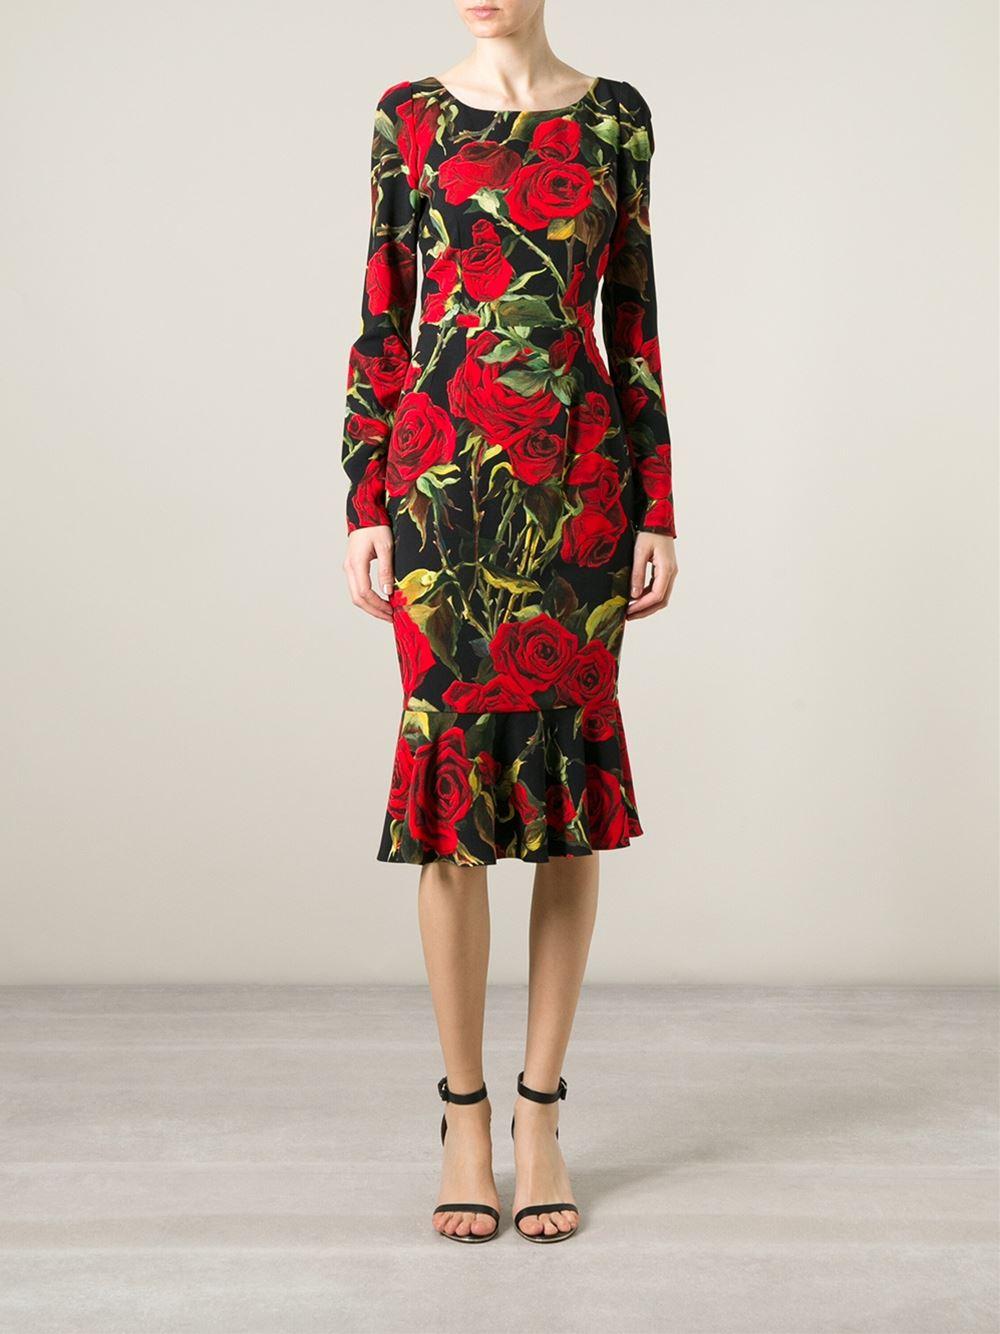 Dolce & Gabbana Rose Print Dress in Red - Lyst